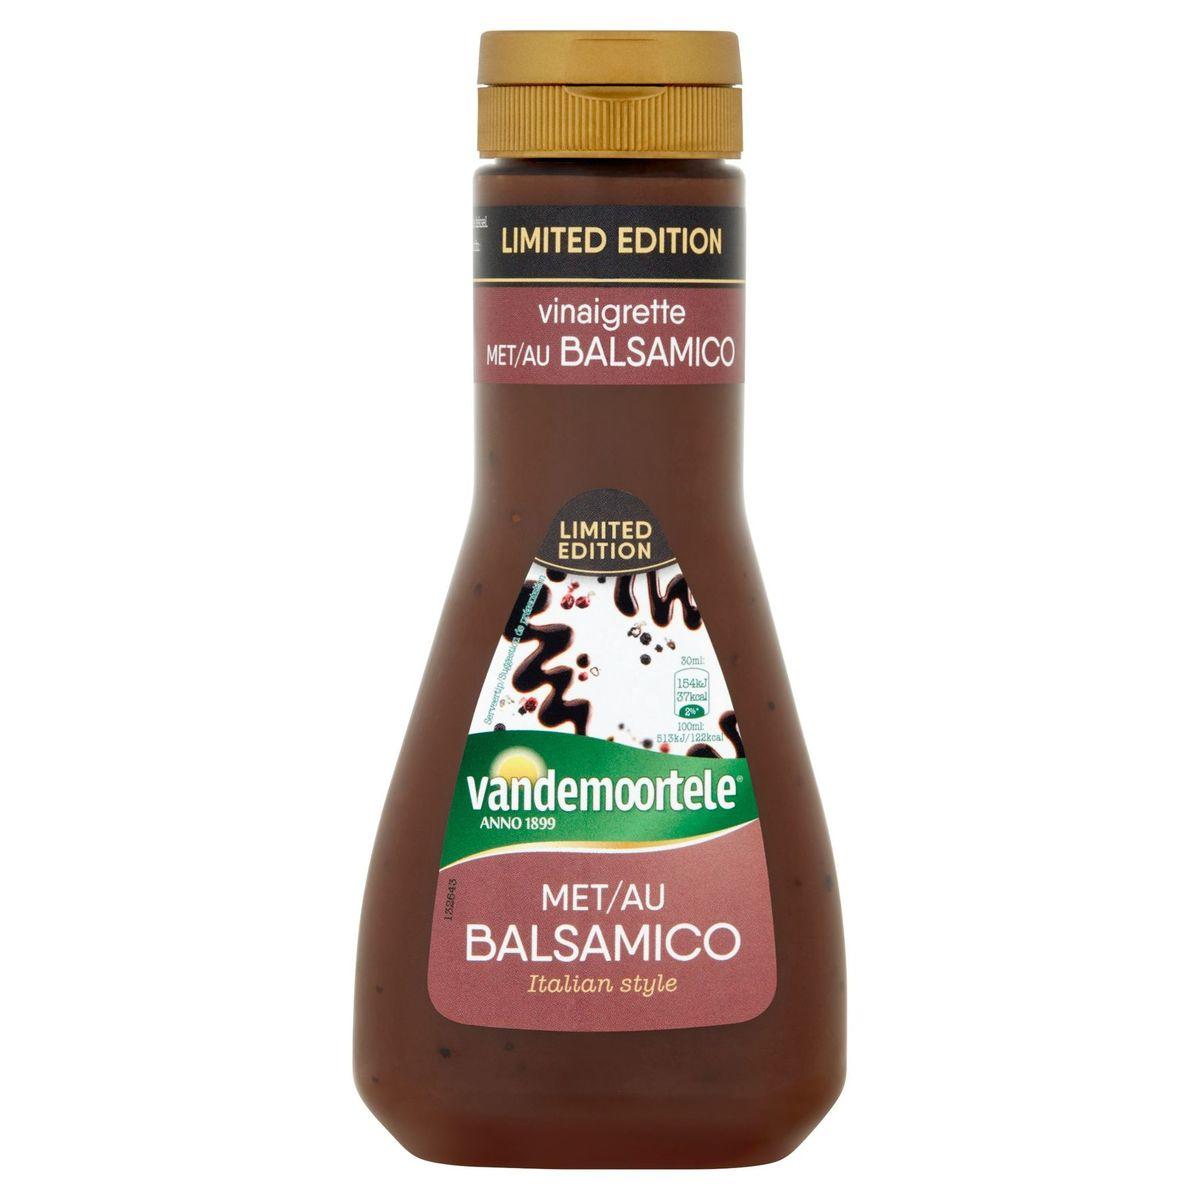 Vandemoortele Vinaigrette met Balsamico Limited Edition 250 ml